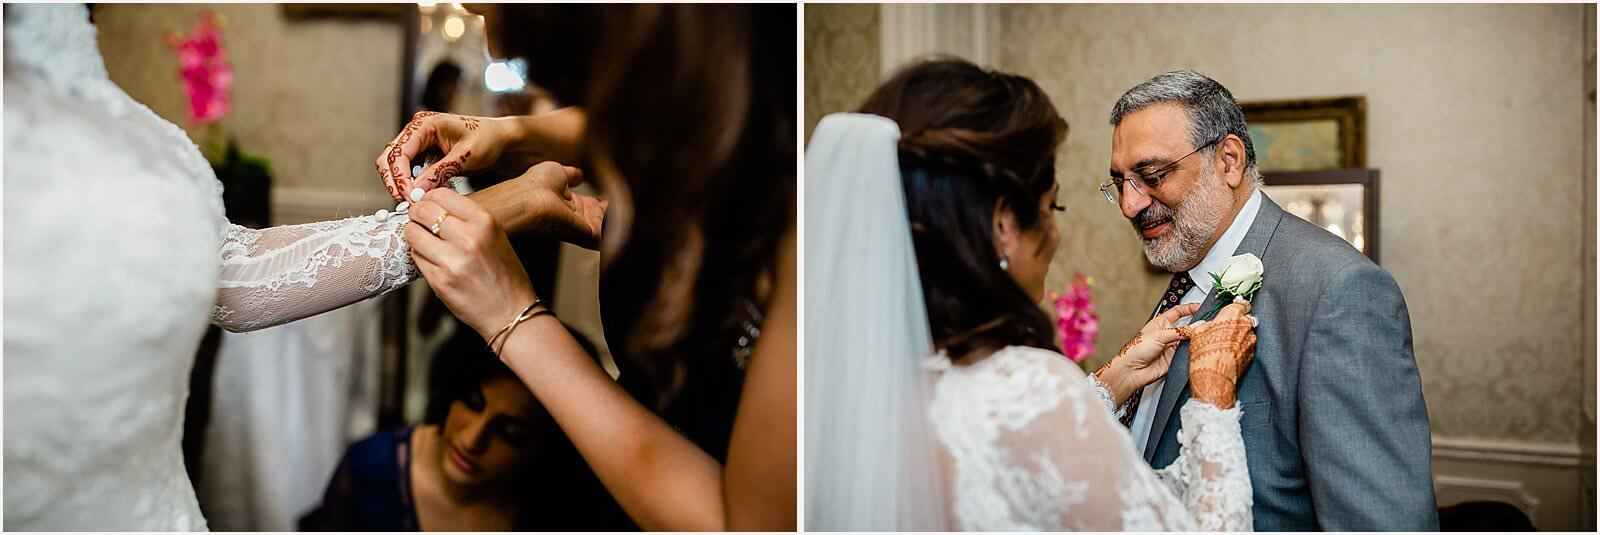 Woodlands Park Hotel Wedding   Anisa & Tristan 15